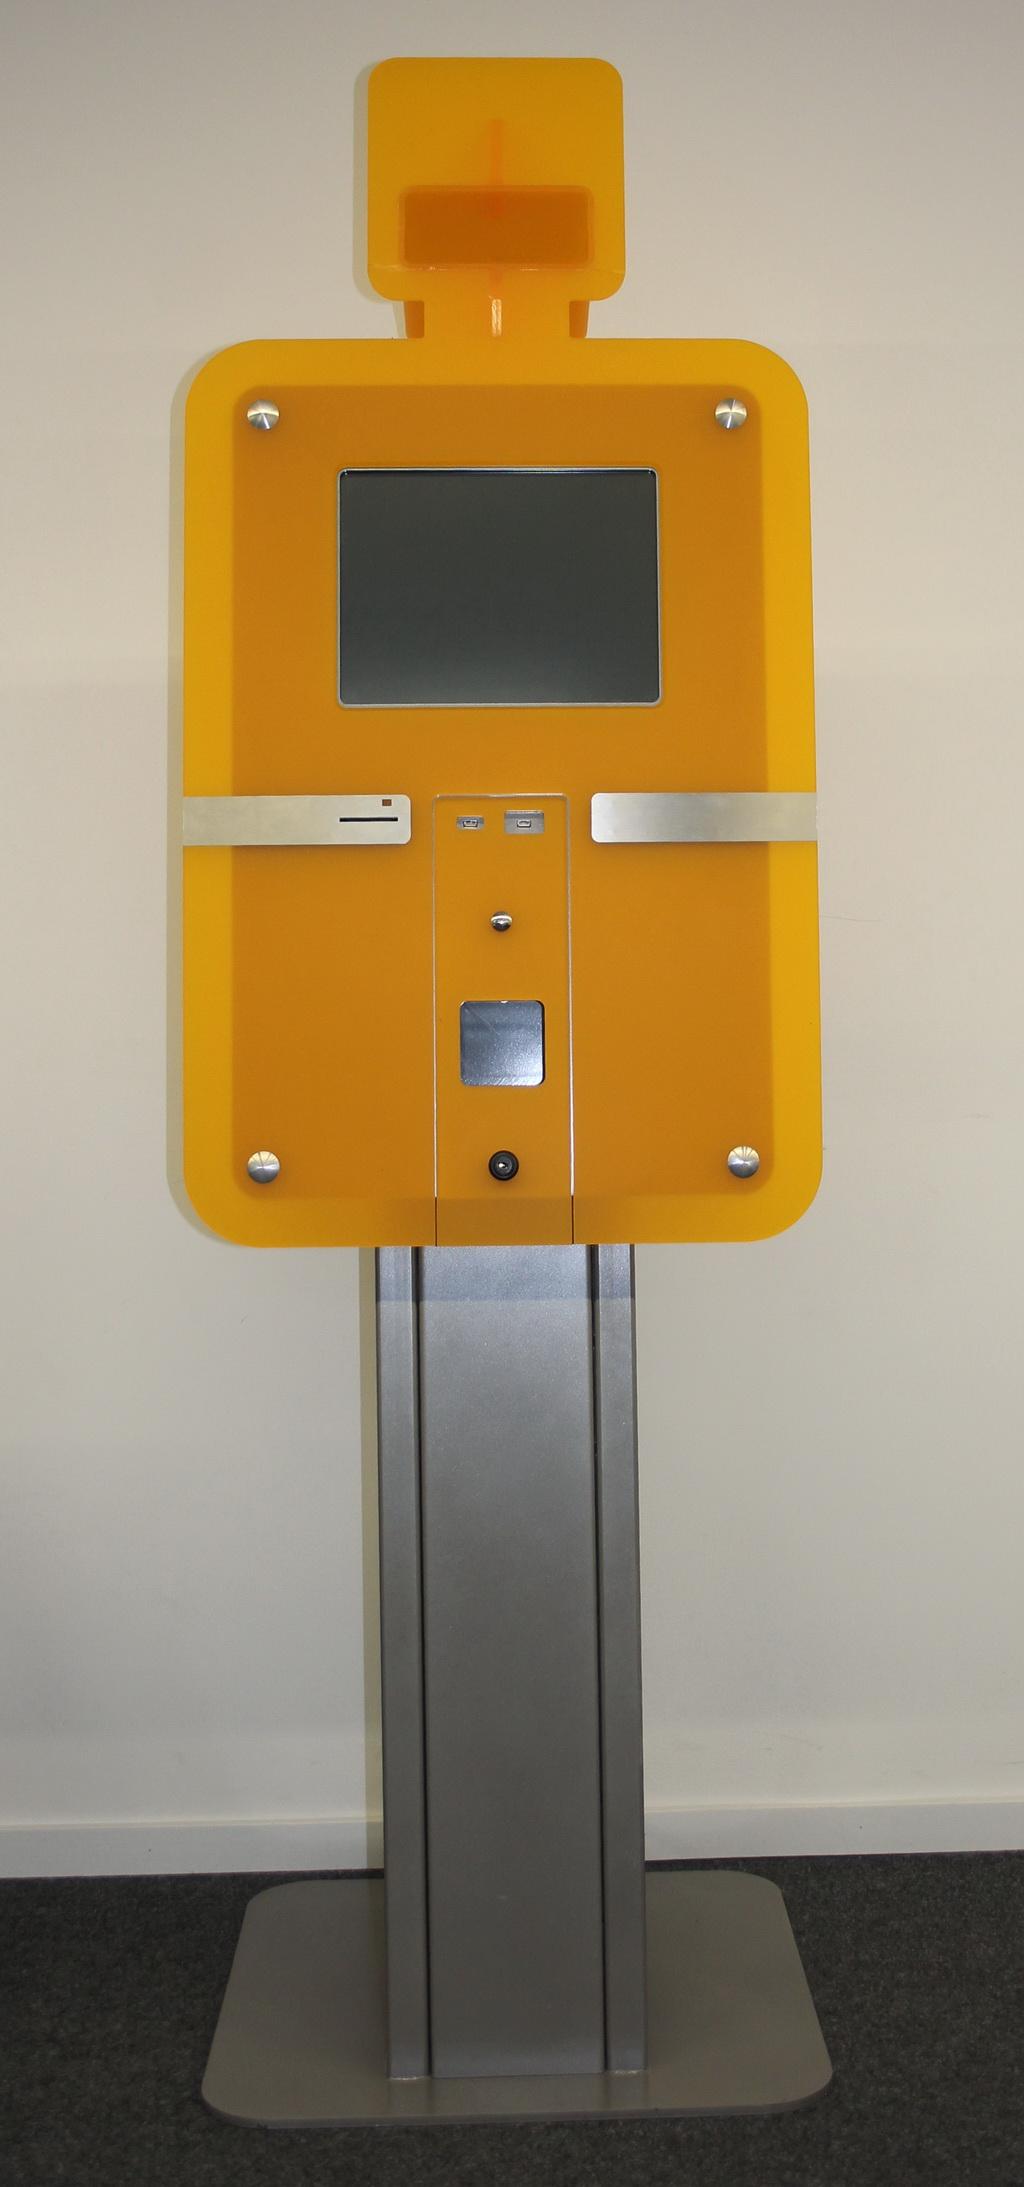 Tachopoint Terminal für Fahrerkarten digitaler Fahrtschreiber